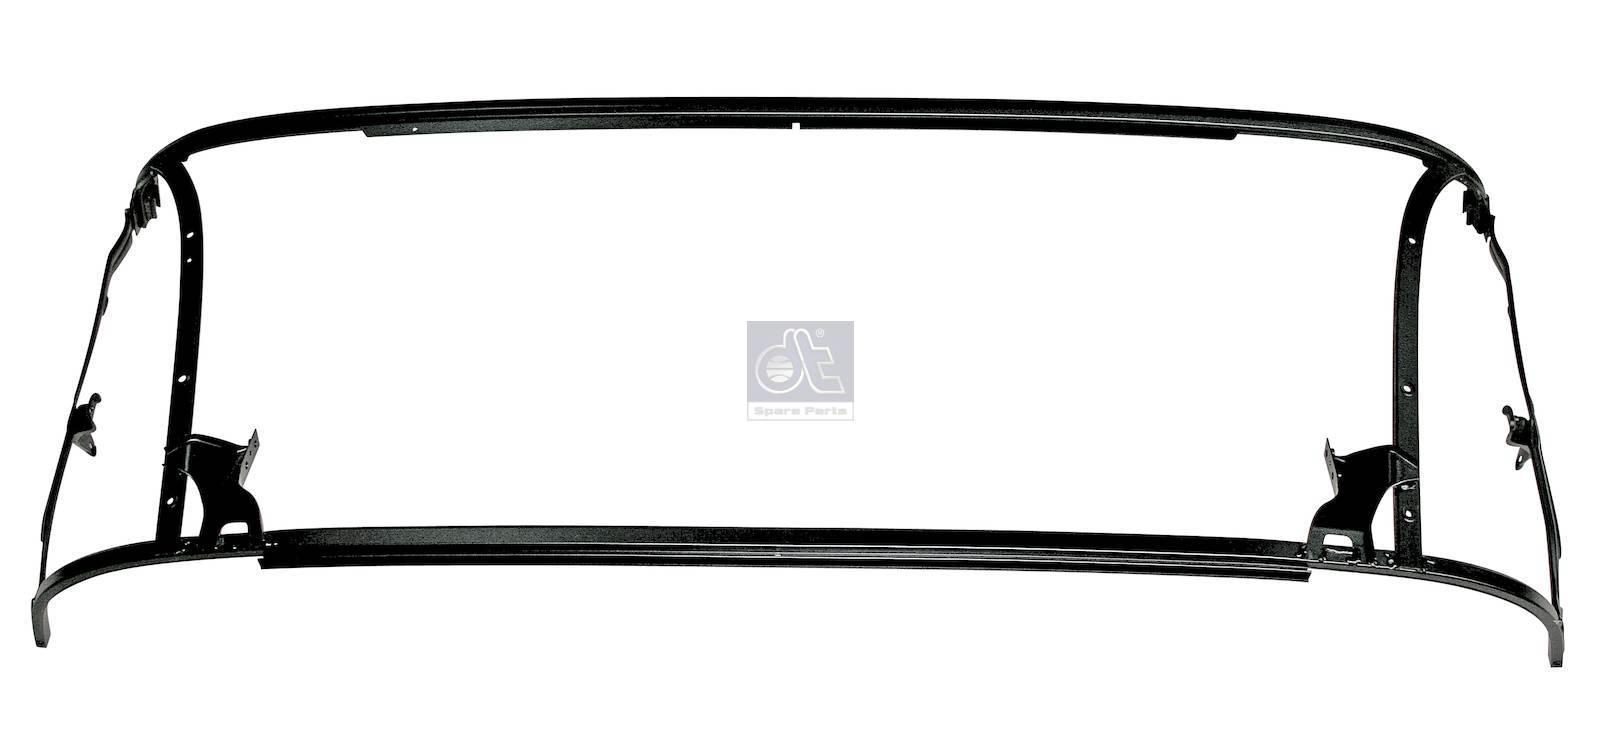 Frame, front flap